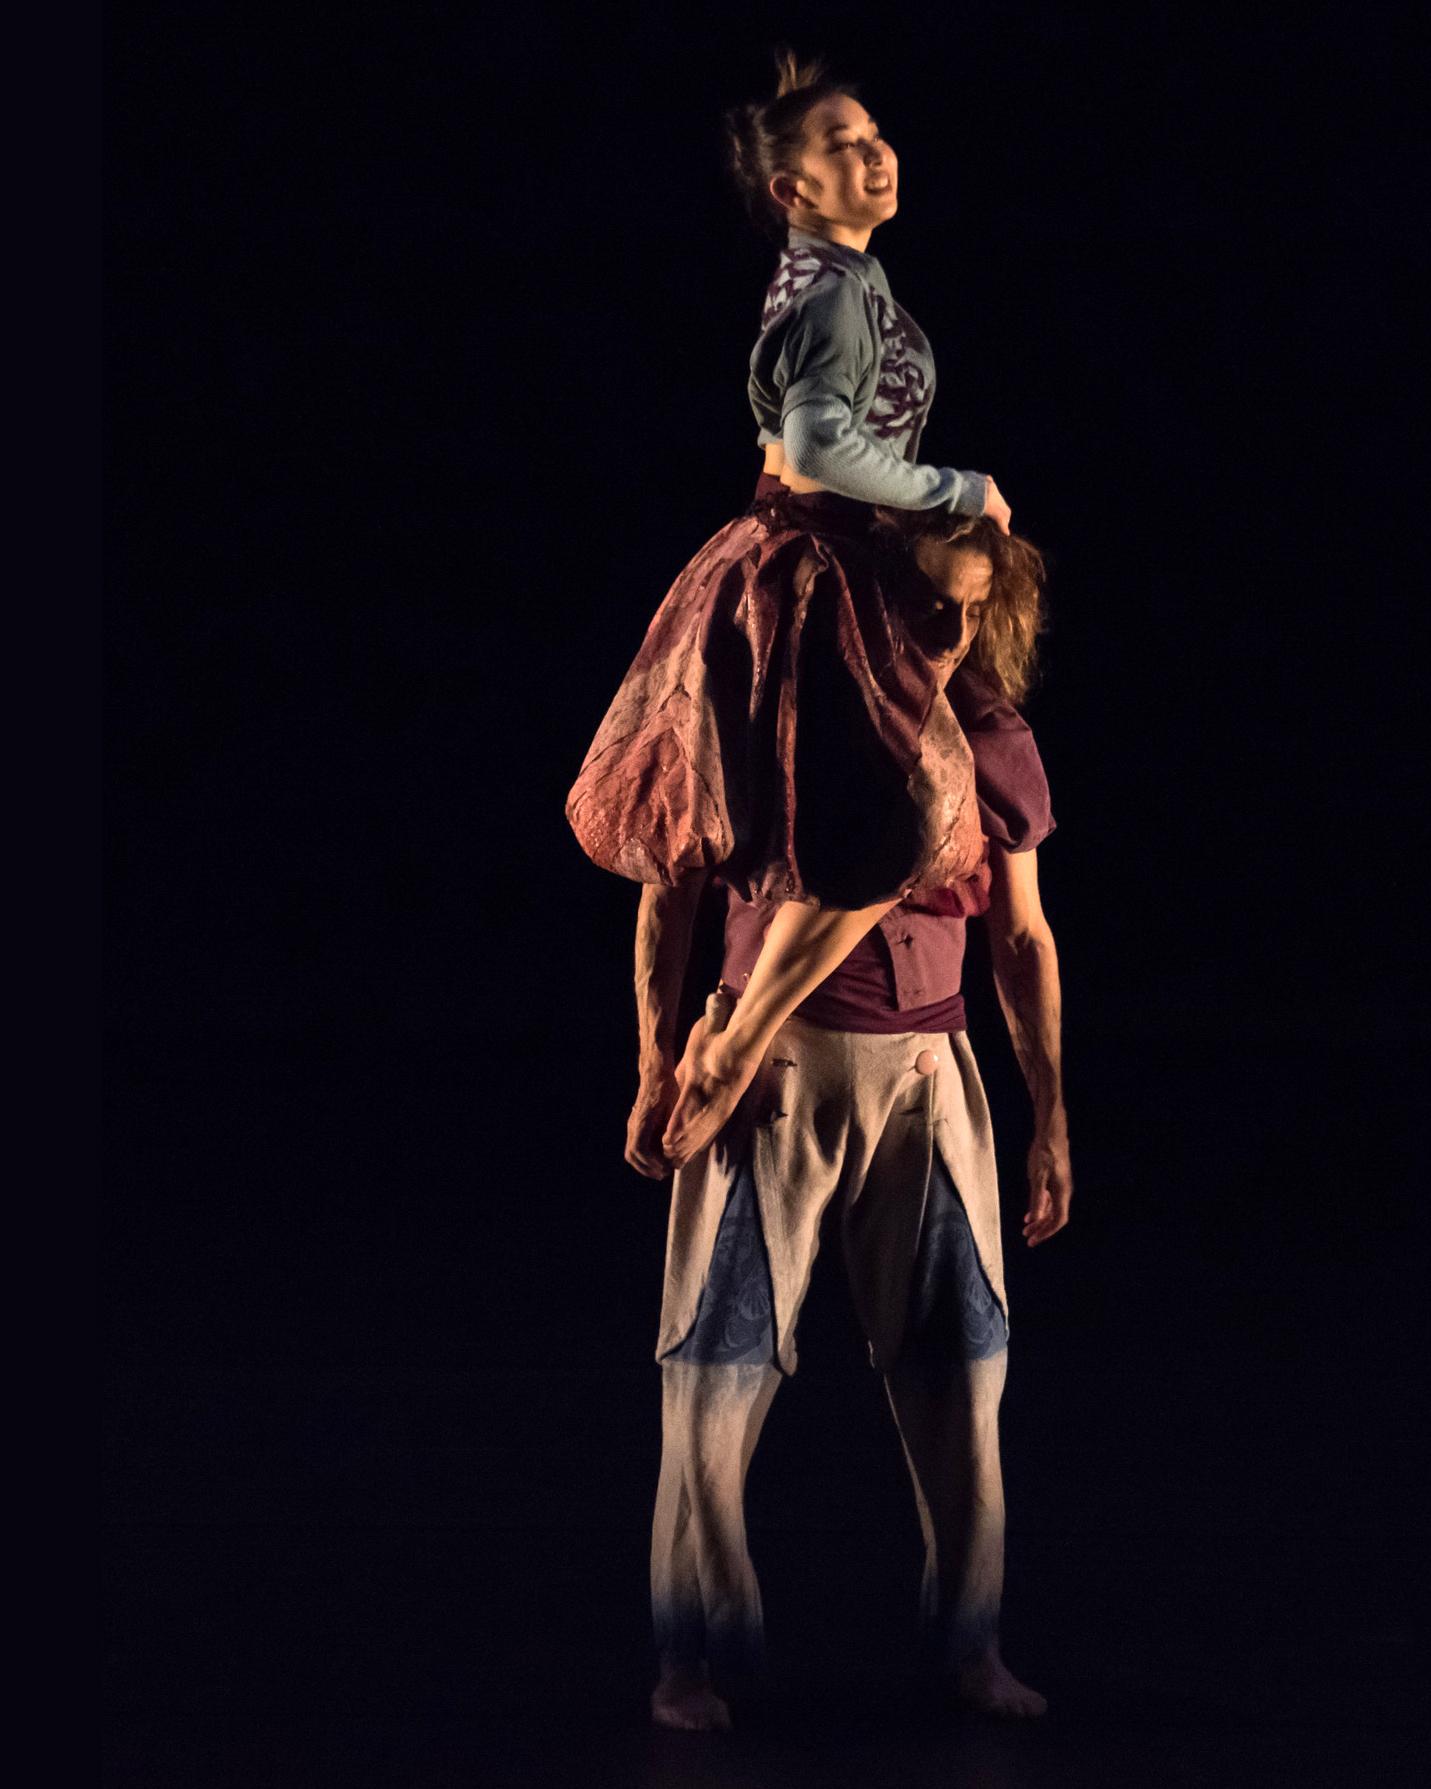 SELECTe - Backhausdance2018_TheEmptyRoom_PhotobyDougGifford_3013.jpg